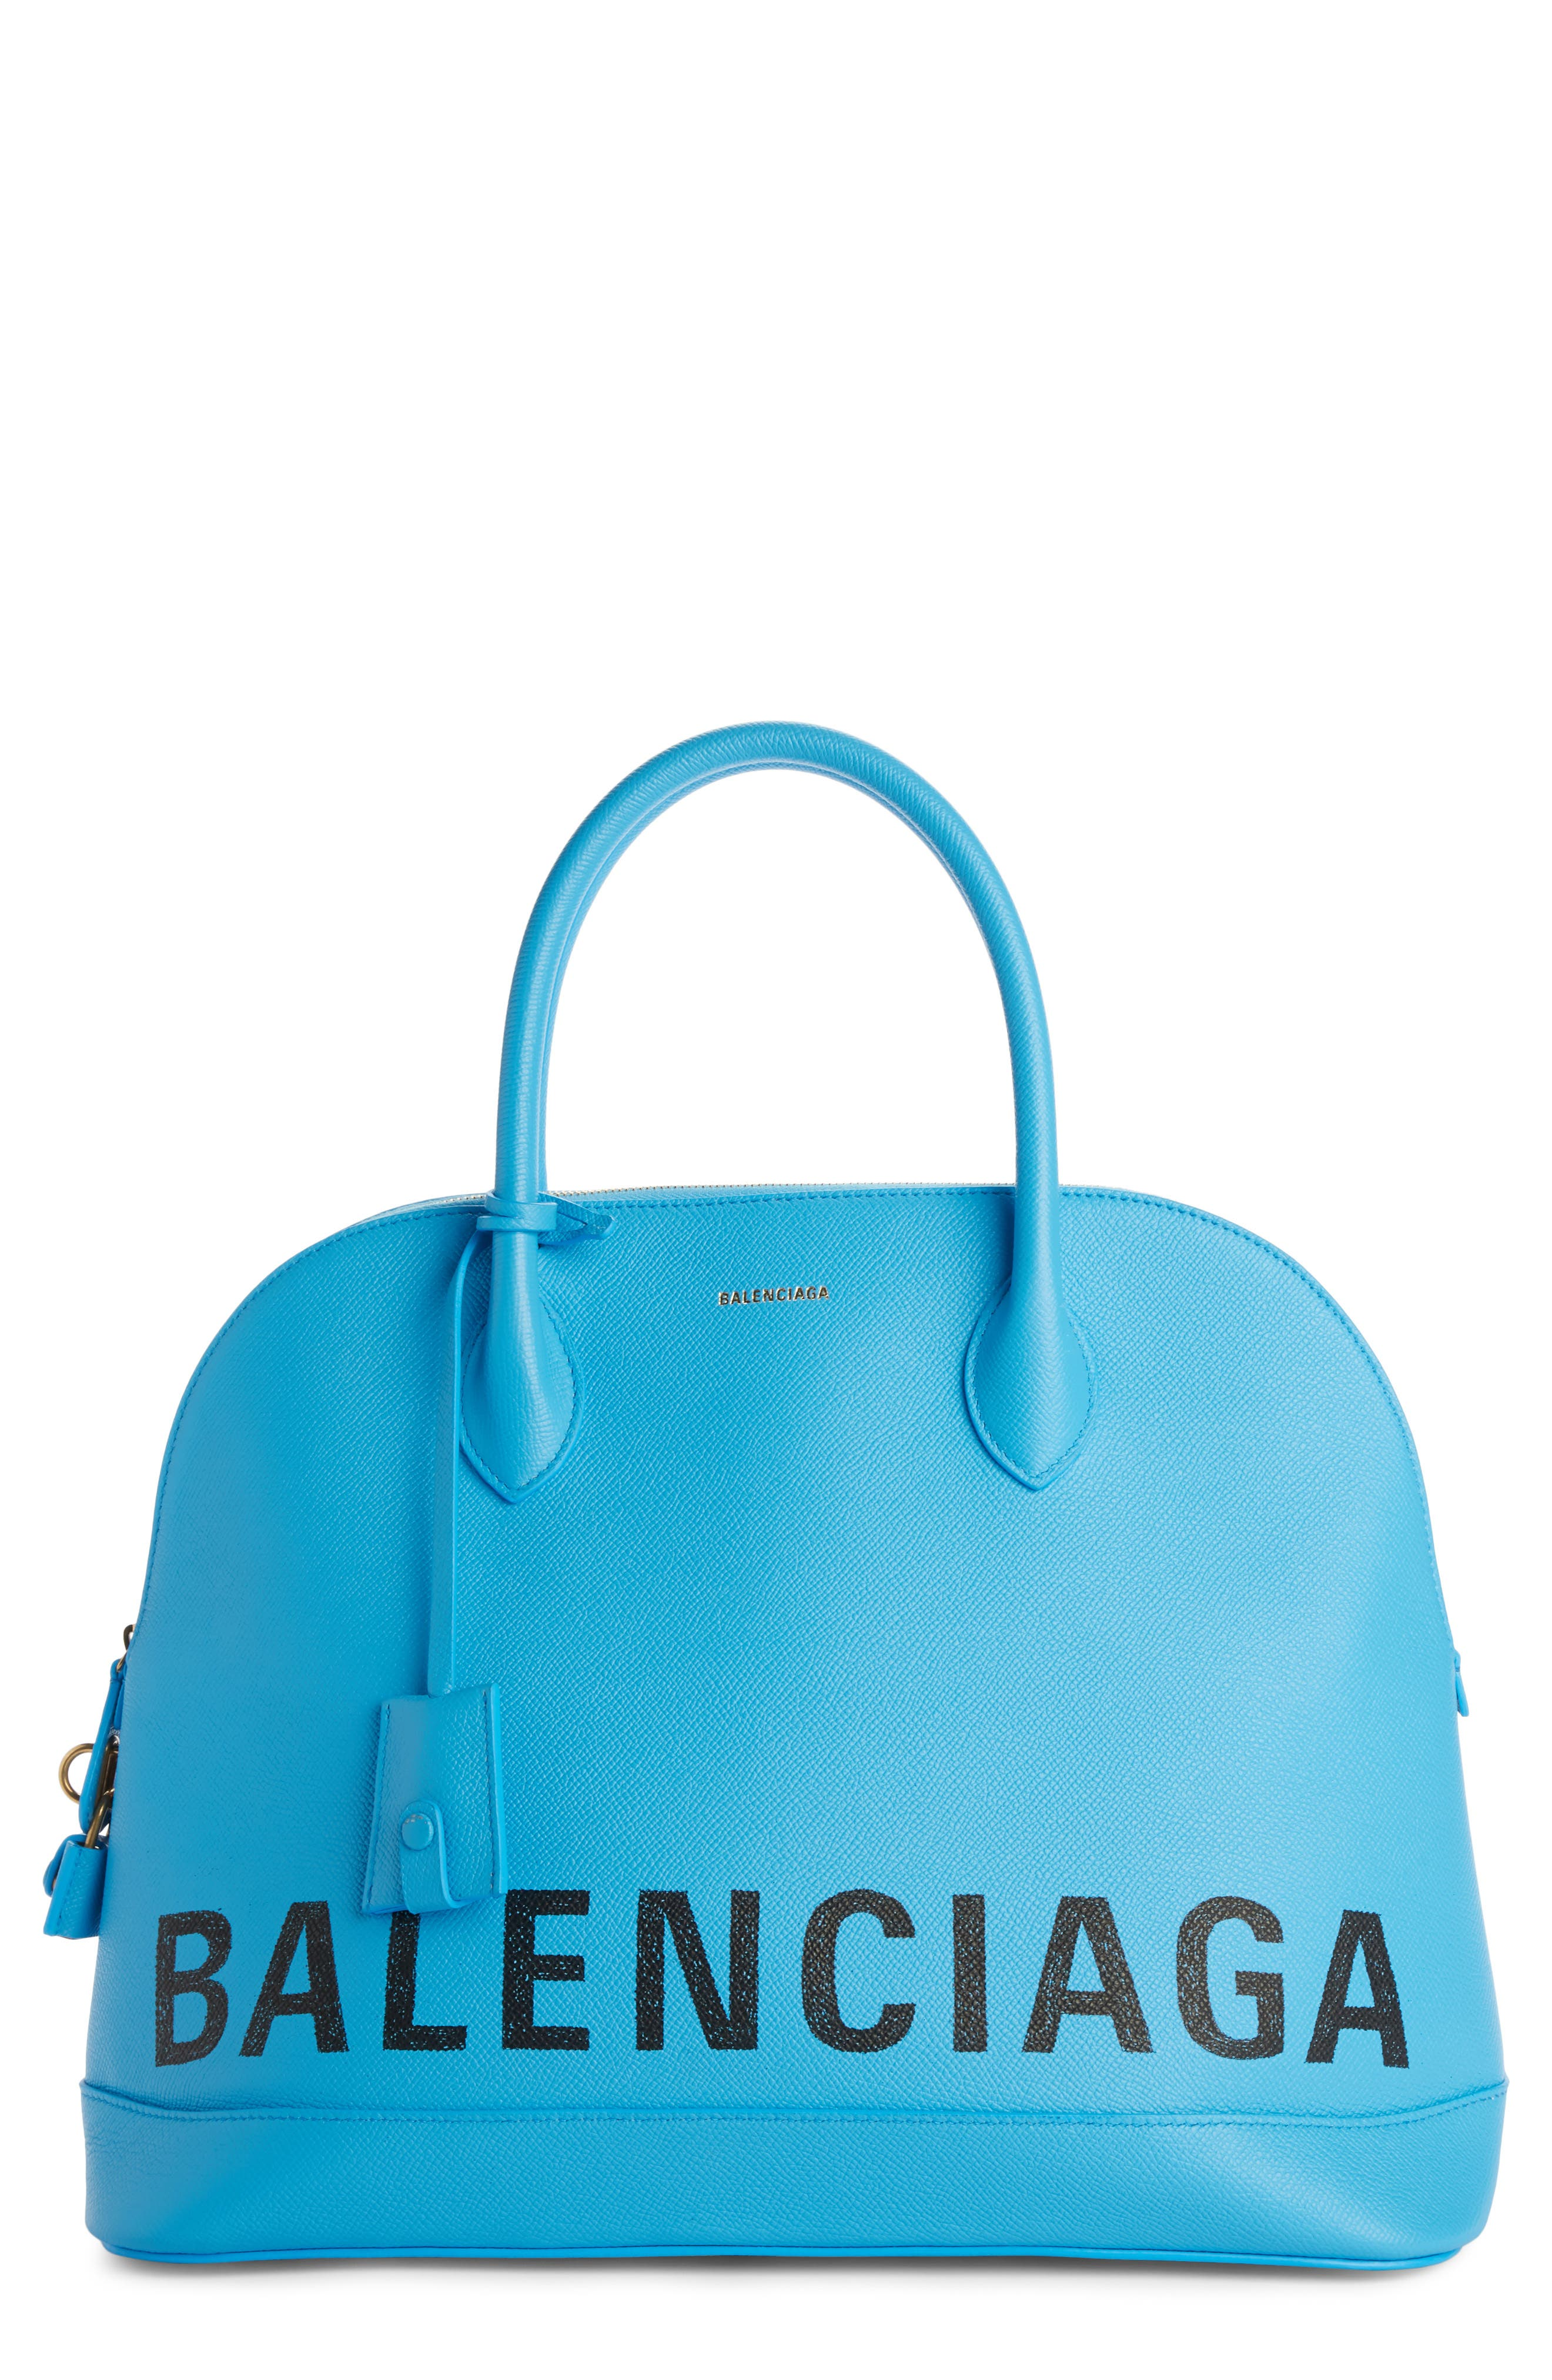 Balenciaga Medium Logo Leather Satchel with Water Repellent Coat